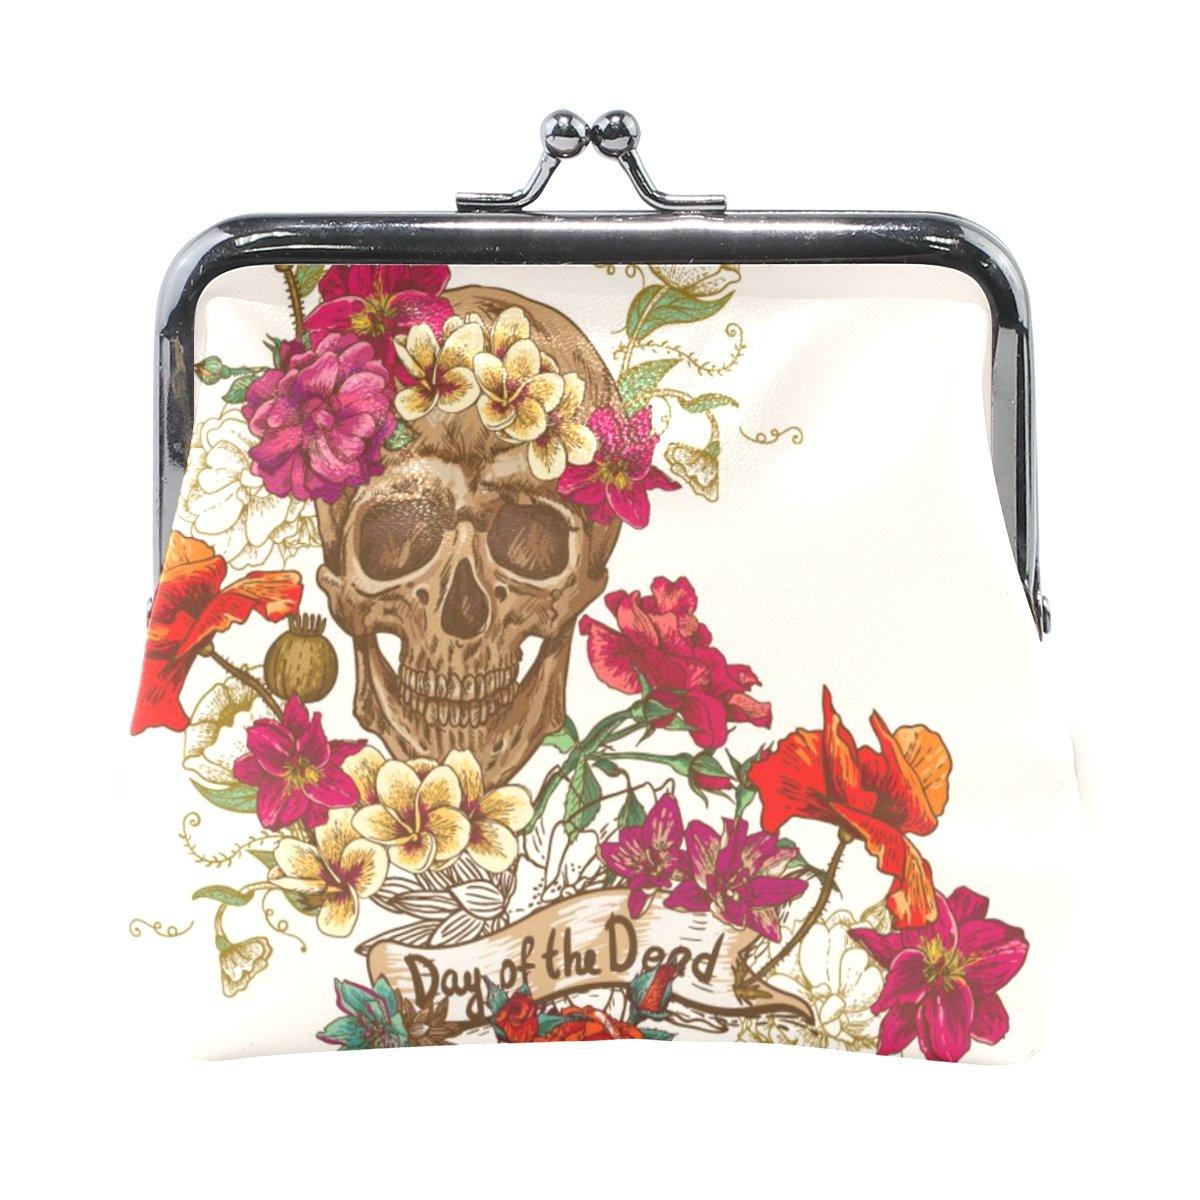 Vipsk mom gift ideas Gothic Beautiful Skull PU Leather Wallet Card Holder Coin Purse Clutch Handbag OneSize